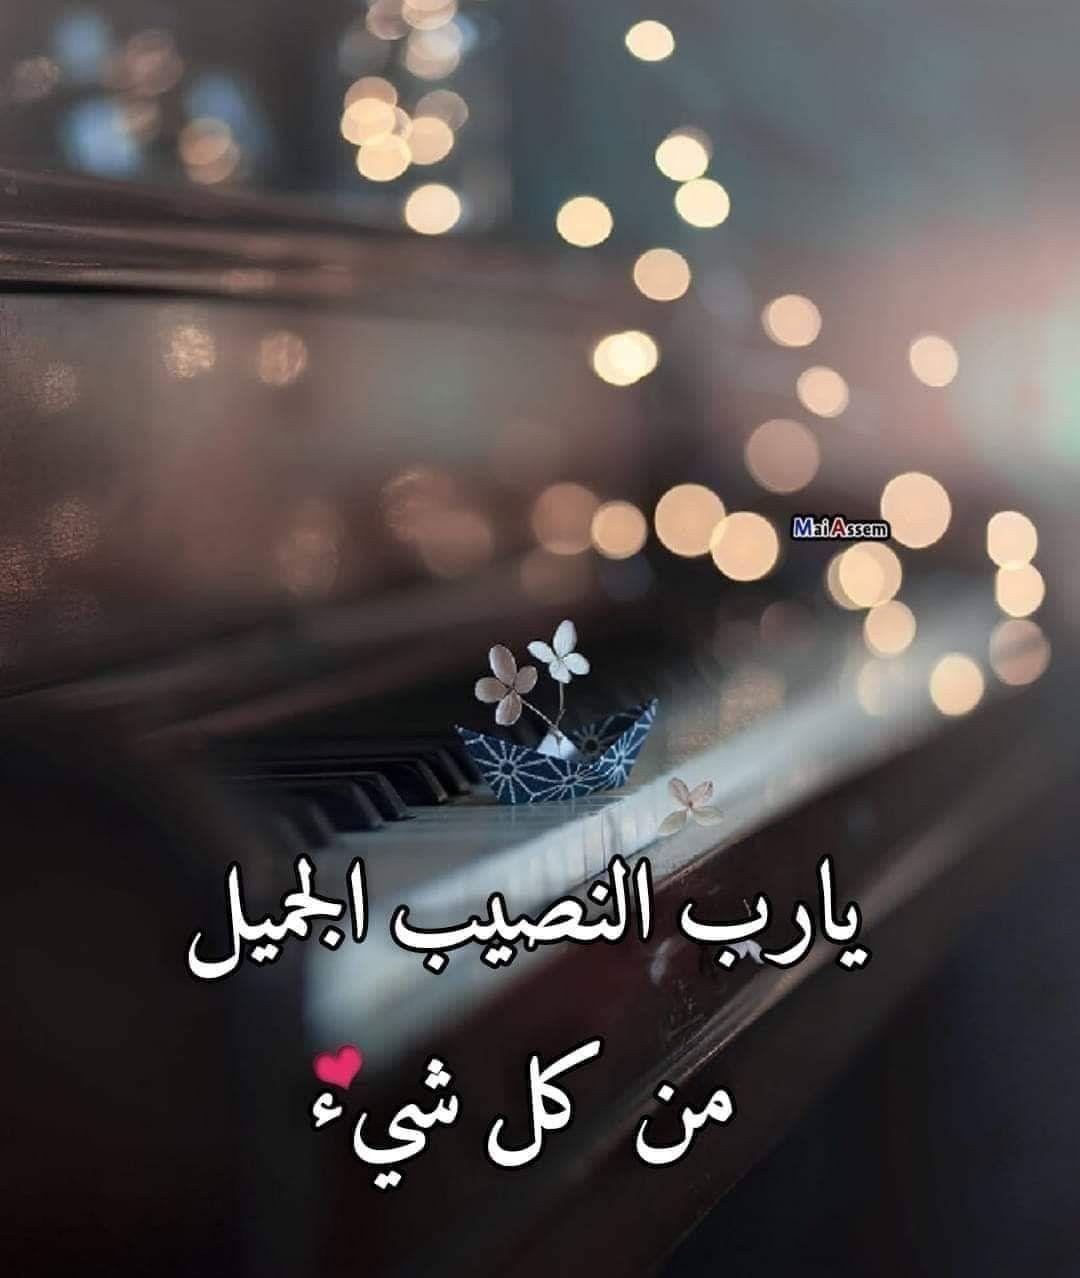 Pin By ʚɞsam Soumaʚɞ On ياااارب العالمين In 2020 Arabic Love Quotes Arabic Quotes Love Quotes